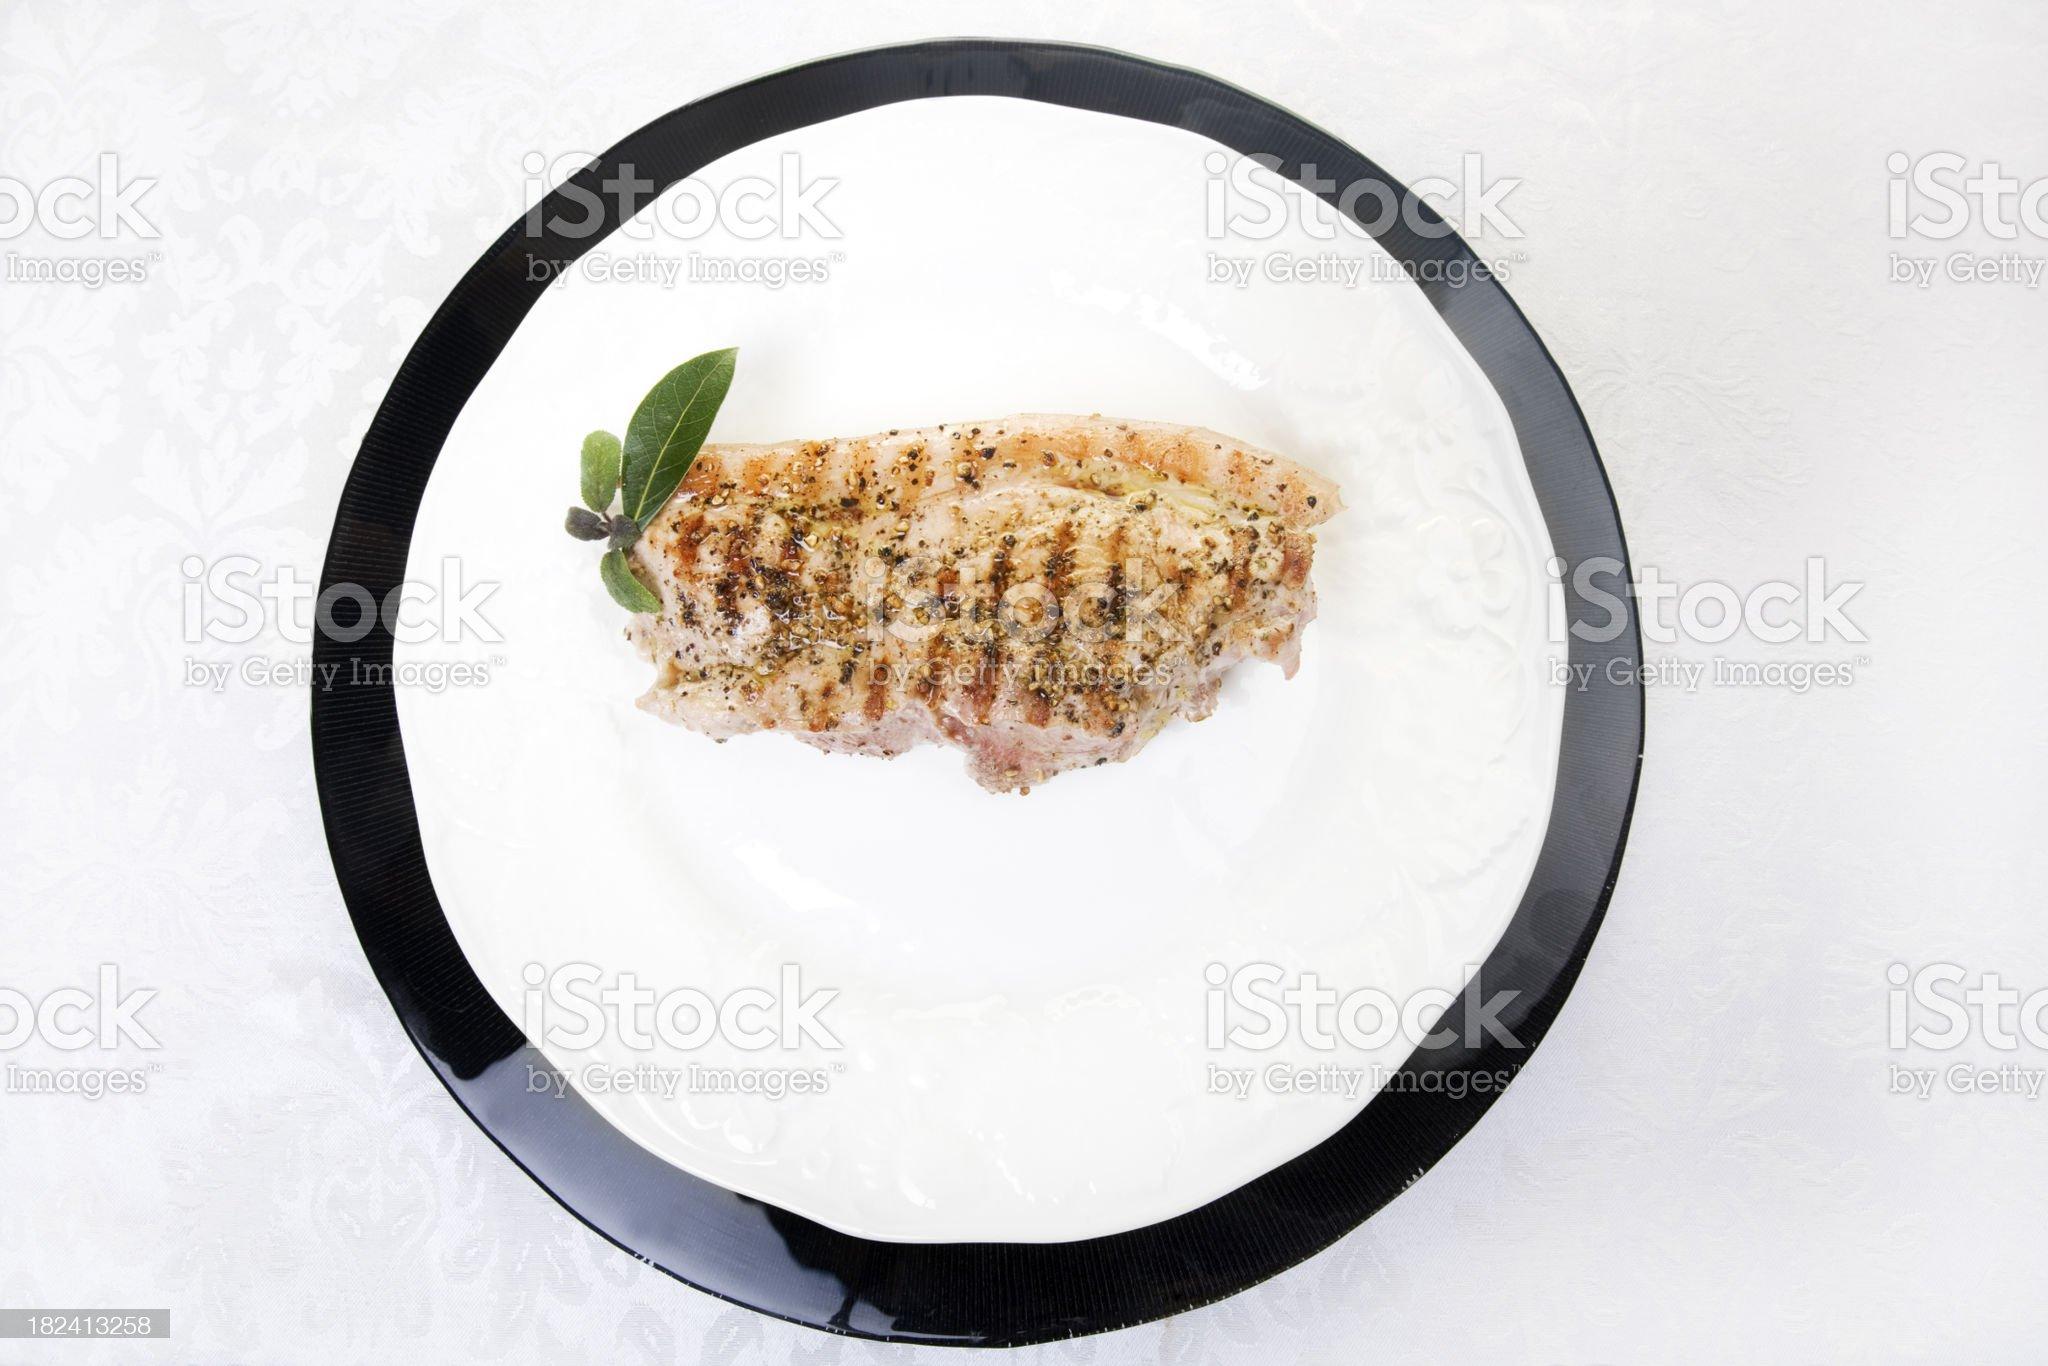 pork chop on plate royalty-free stock photo